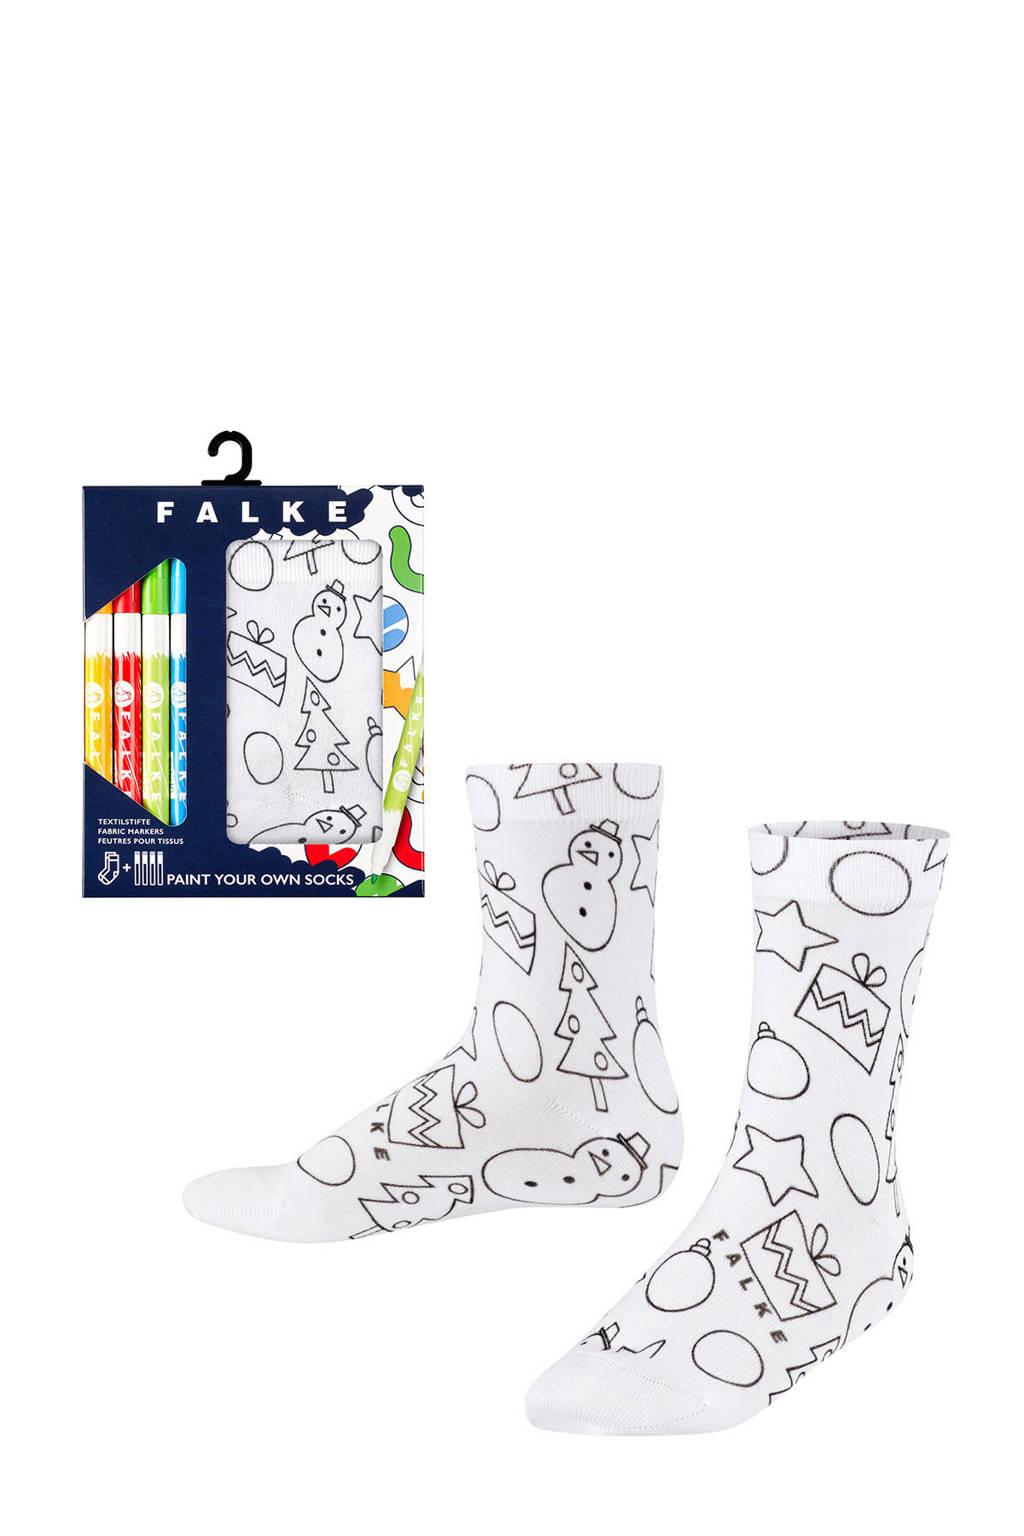 FALKE X-mas Paint sokken met inkleurbare print, Wit